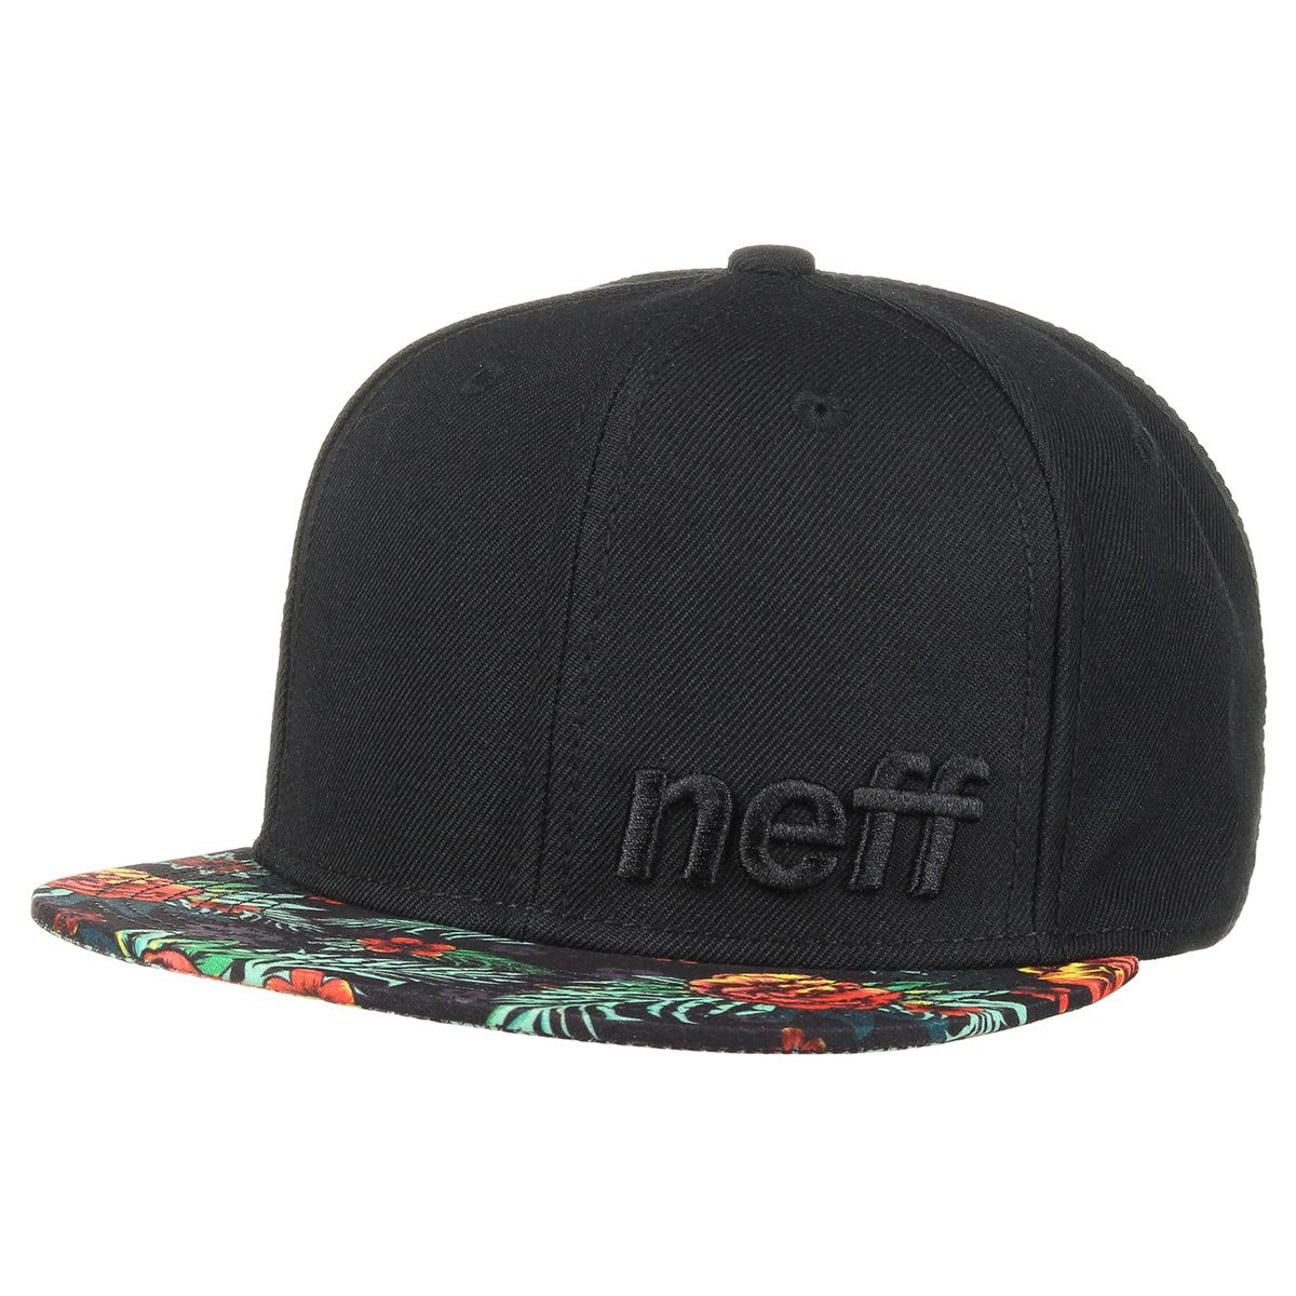 5e7cafa86c3 ... Daily Floral Snapback Cap by neff - black 3